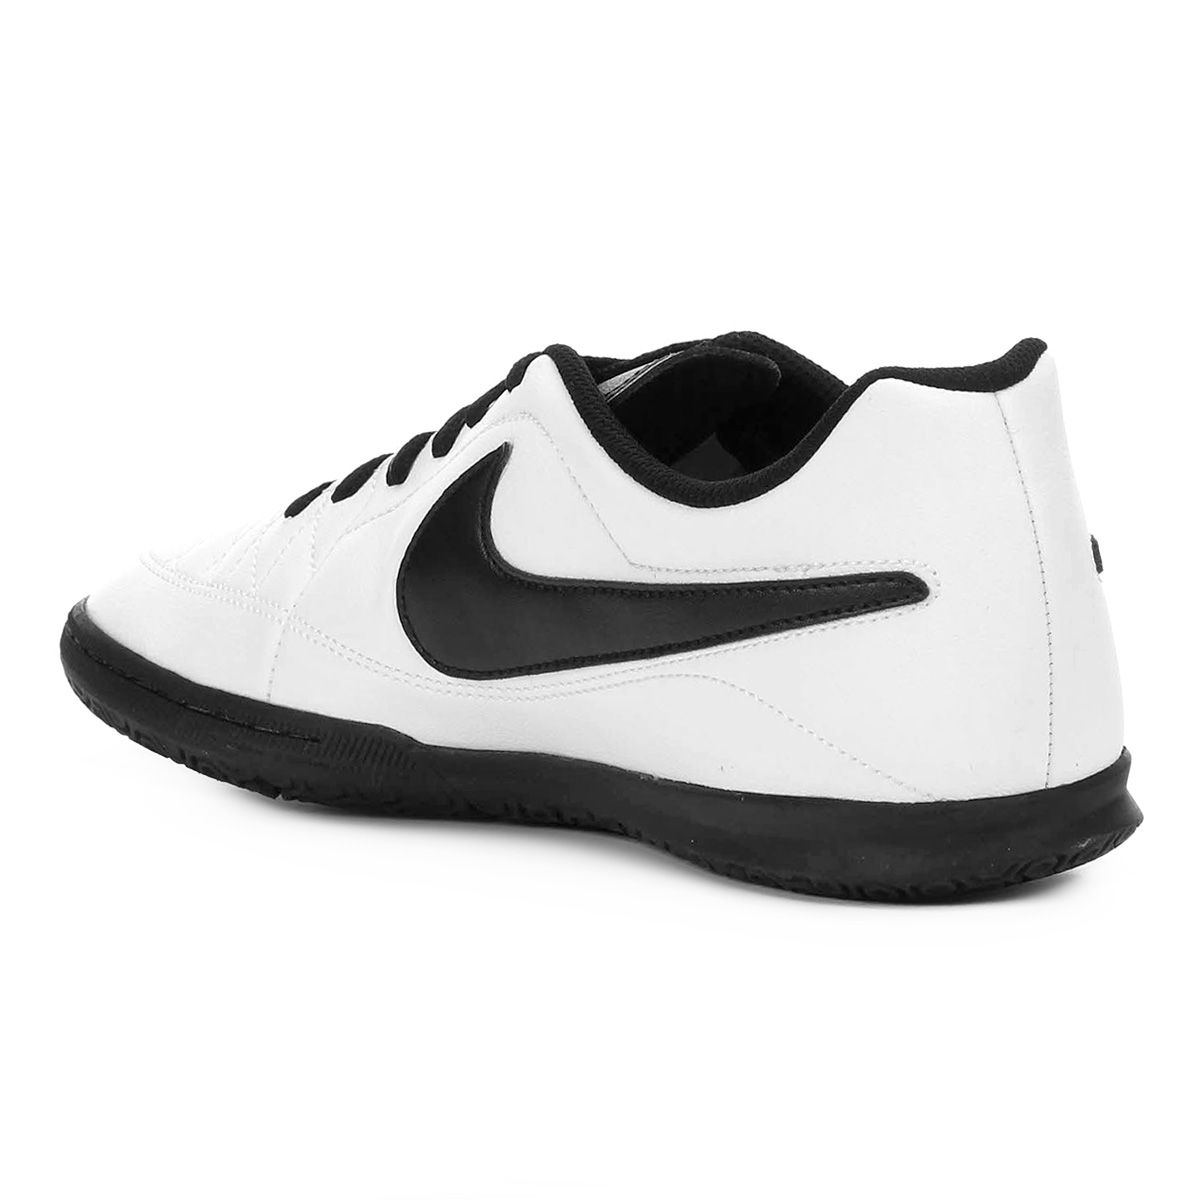 da8426fae588f Chuteira Futsal Nike Majestry Ic - BRACIA SHOP  Loja de Roupas ...